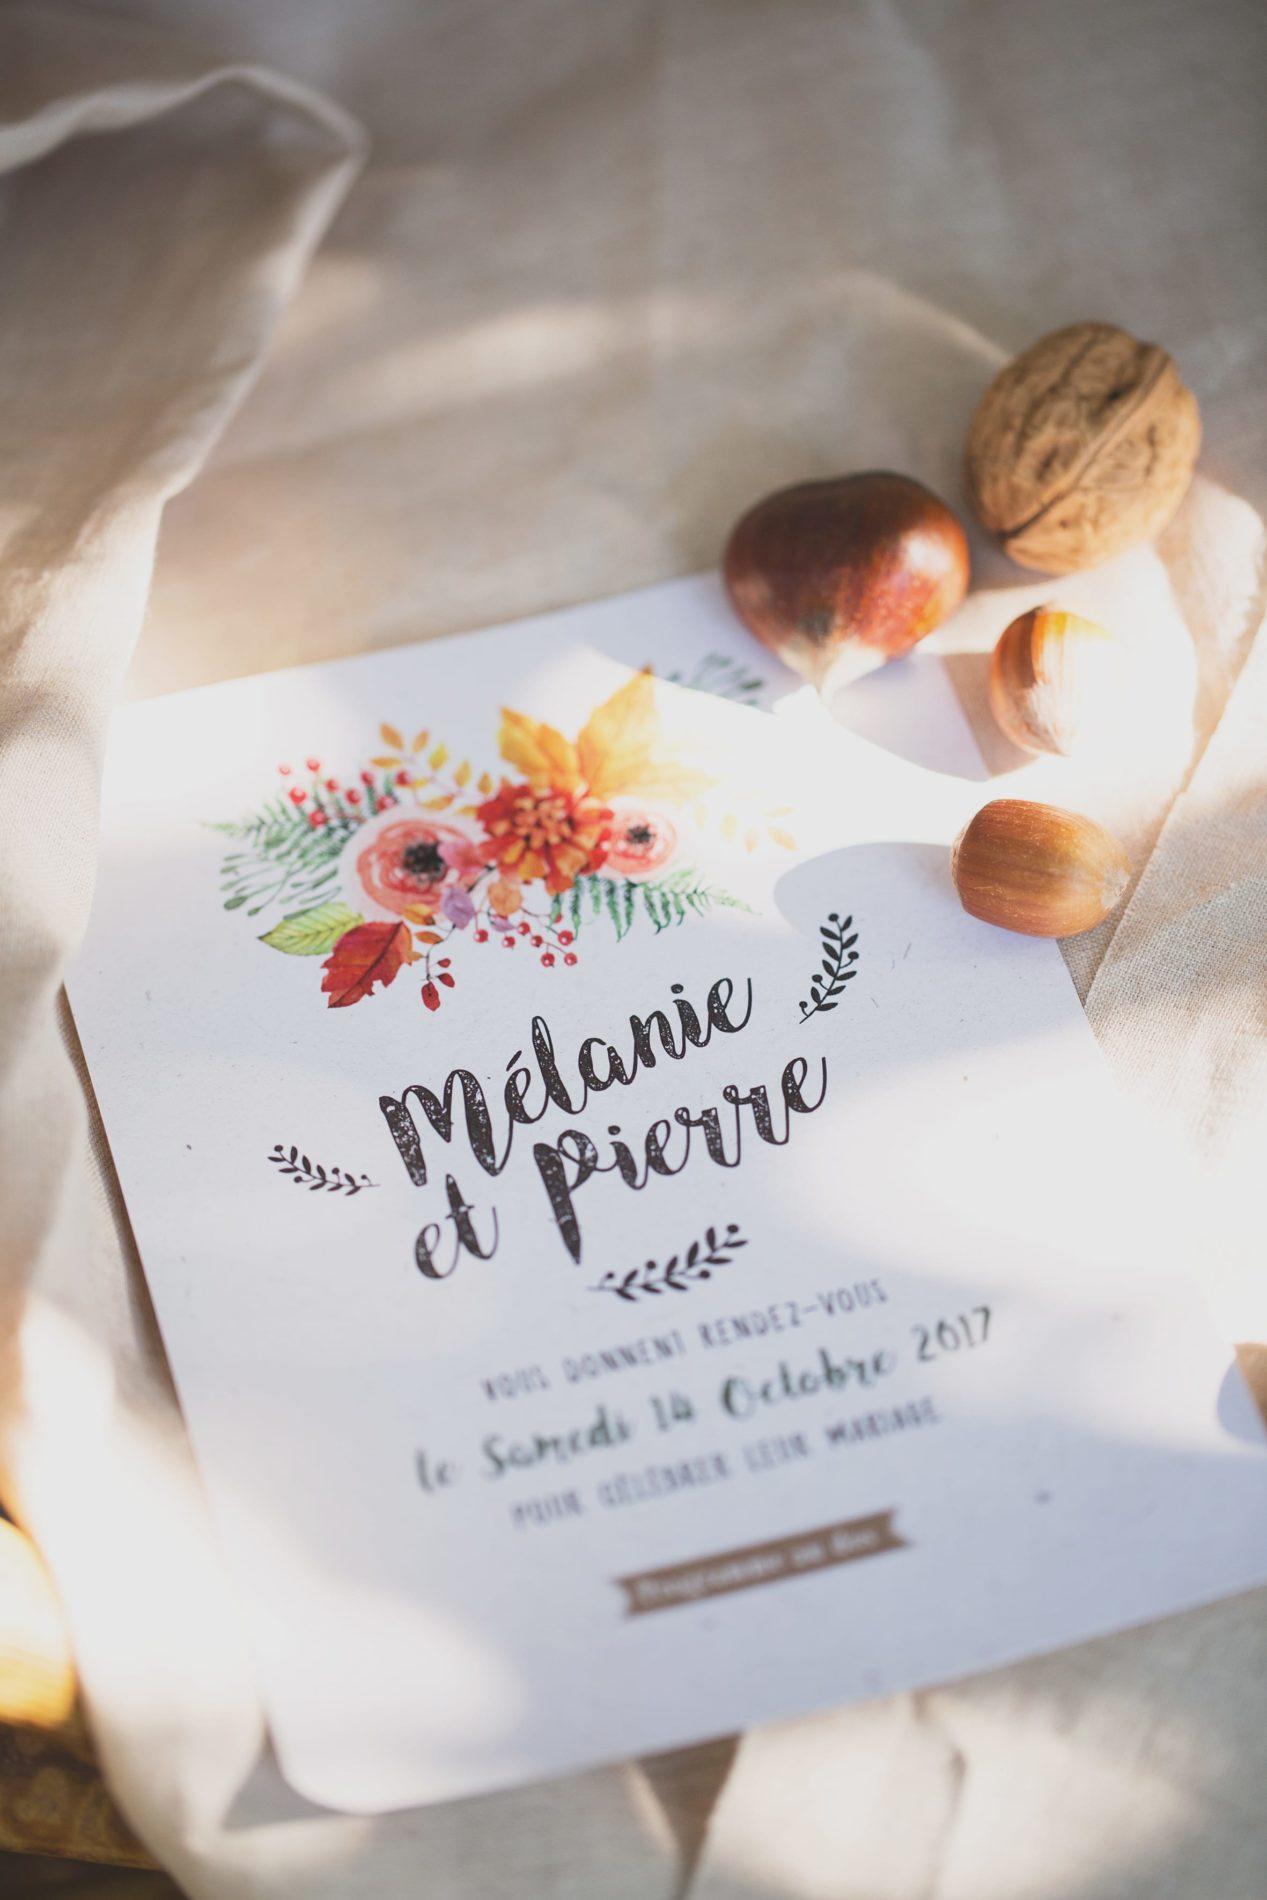 A-lOree-des-Fees-Melanie-Pierre-Deco-60